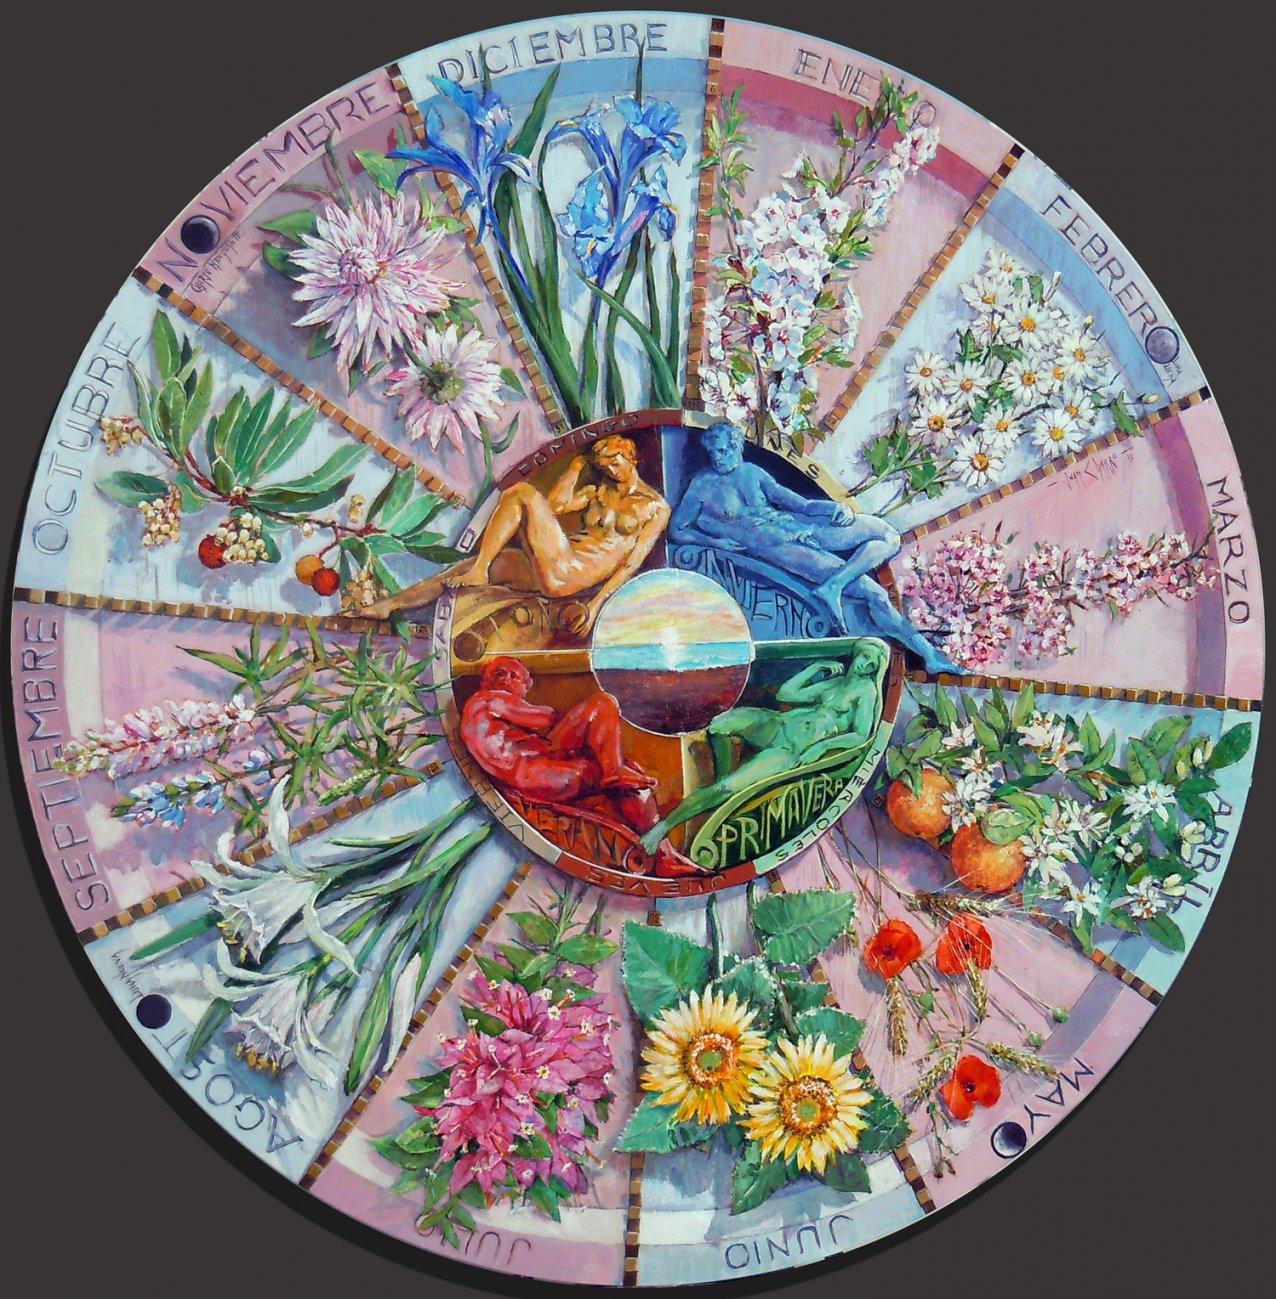 Calendario Floral (2014) - Juan Charro